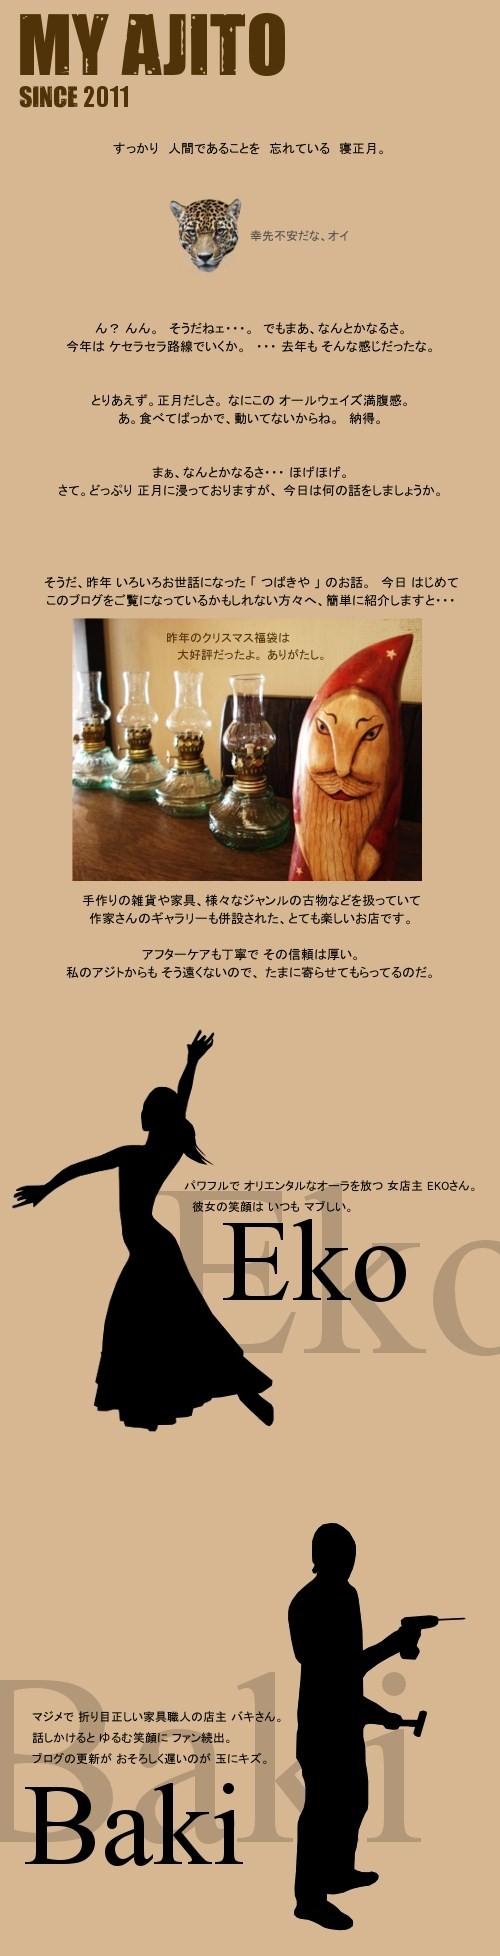 bu_01.jpg